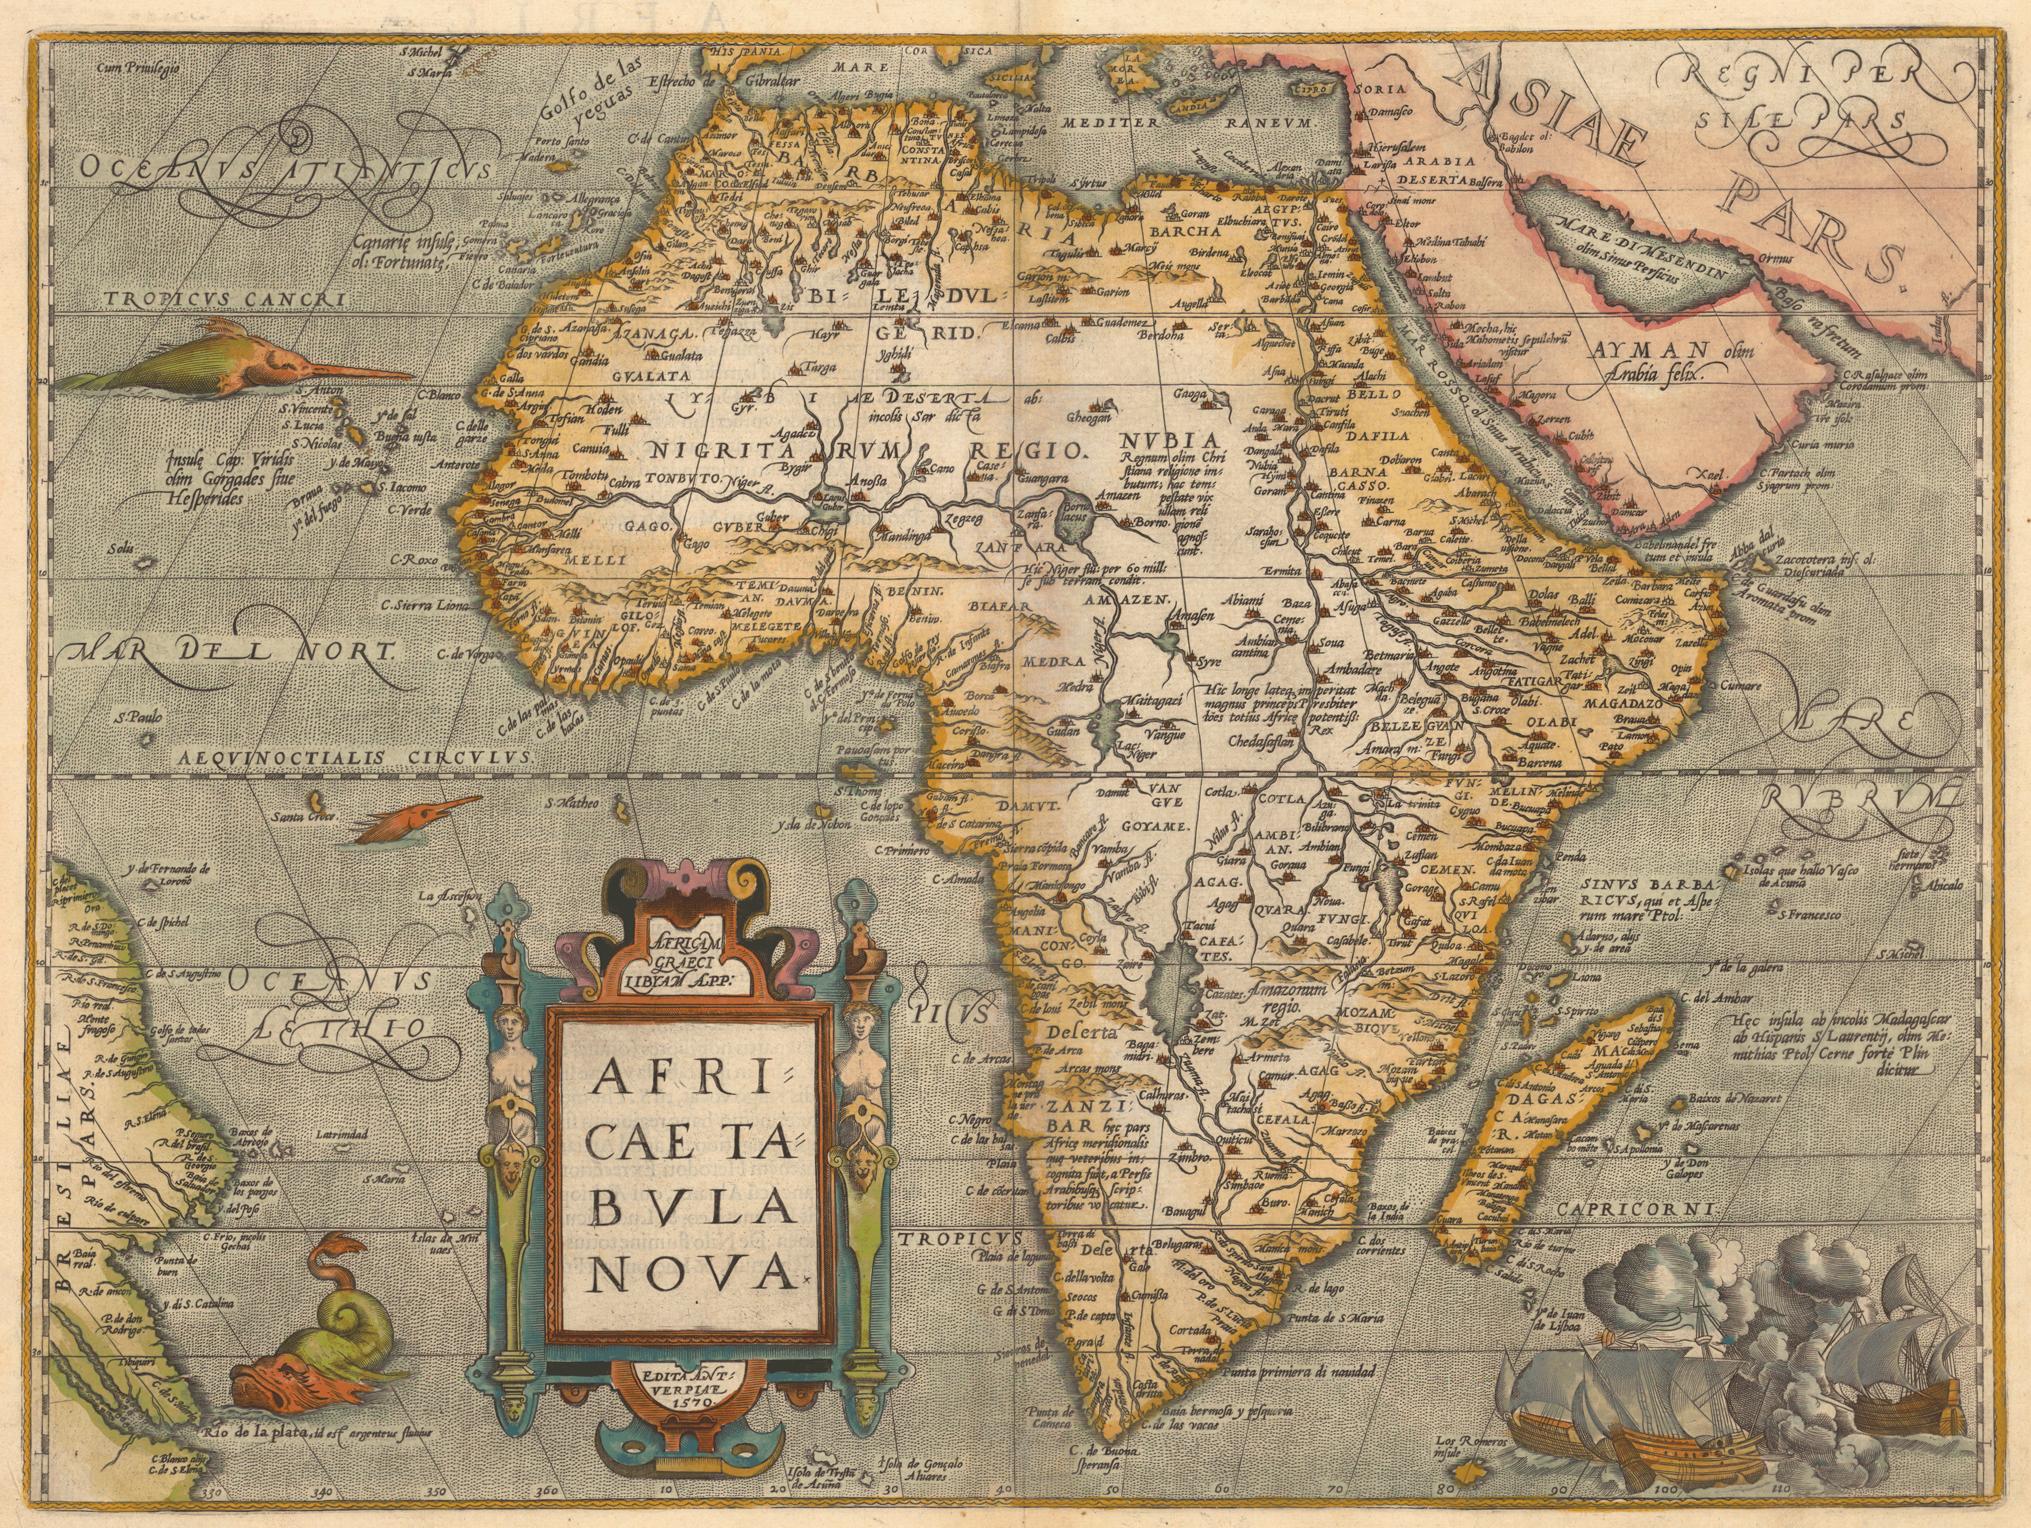 Abraham Ortelius's map from 1584 depicting Africa.